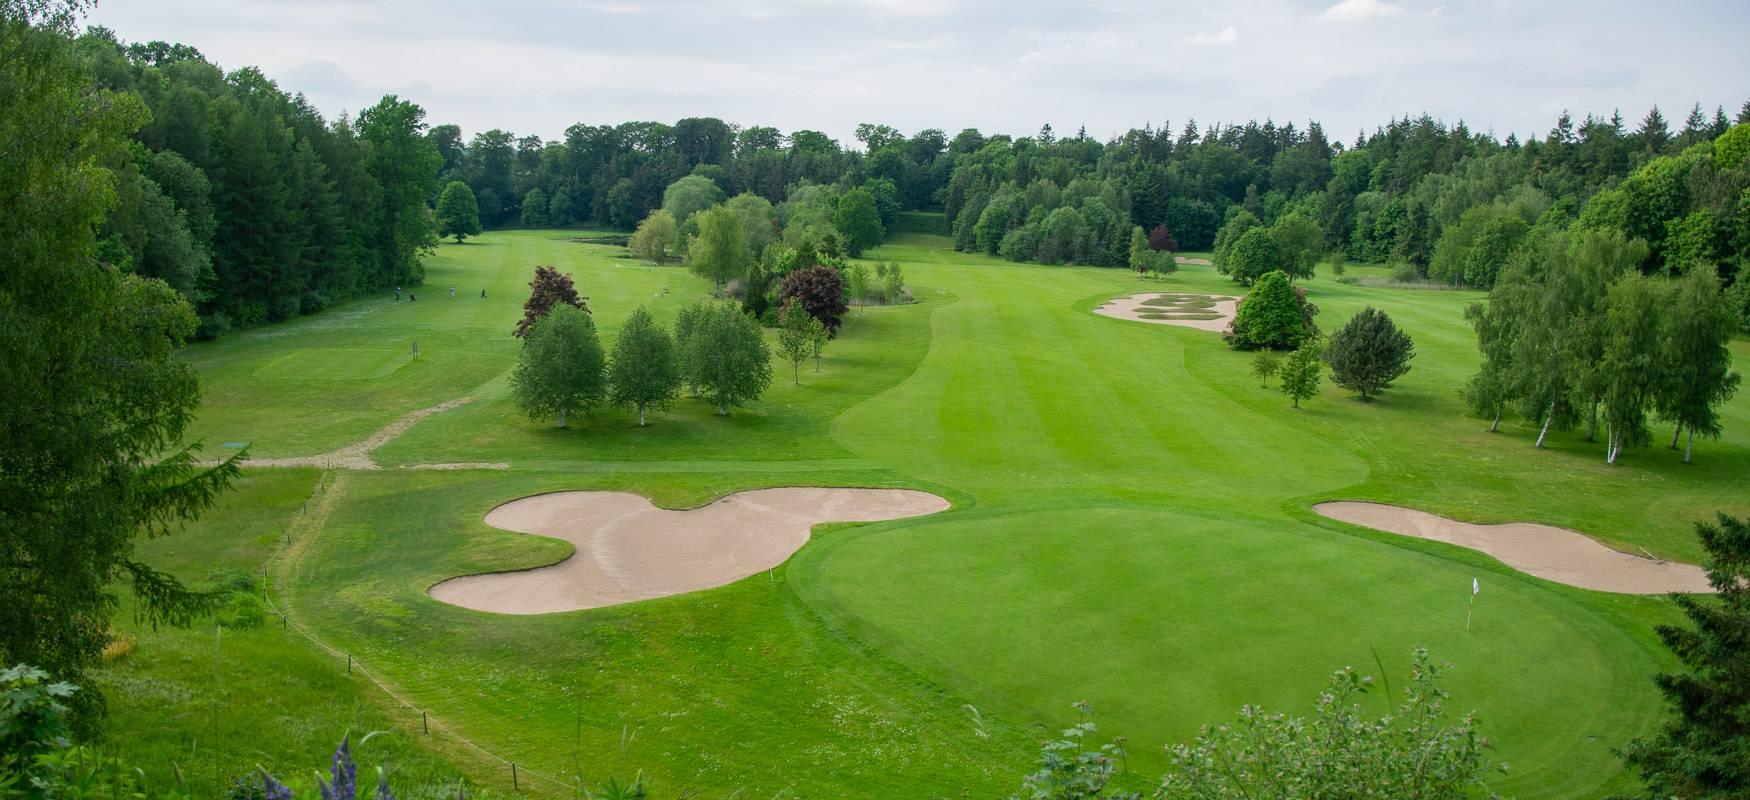 Golf Altenhof Titelbild Beitrag Golf